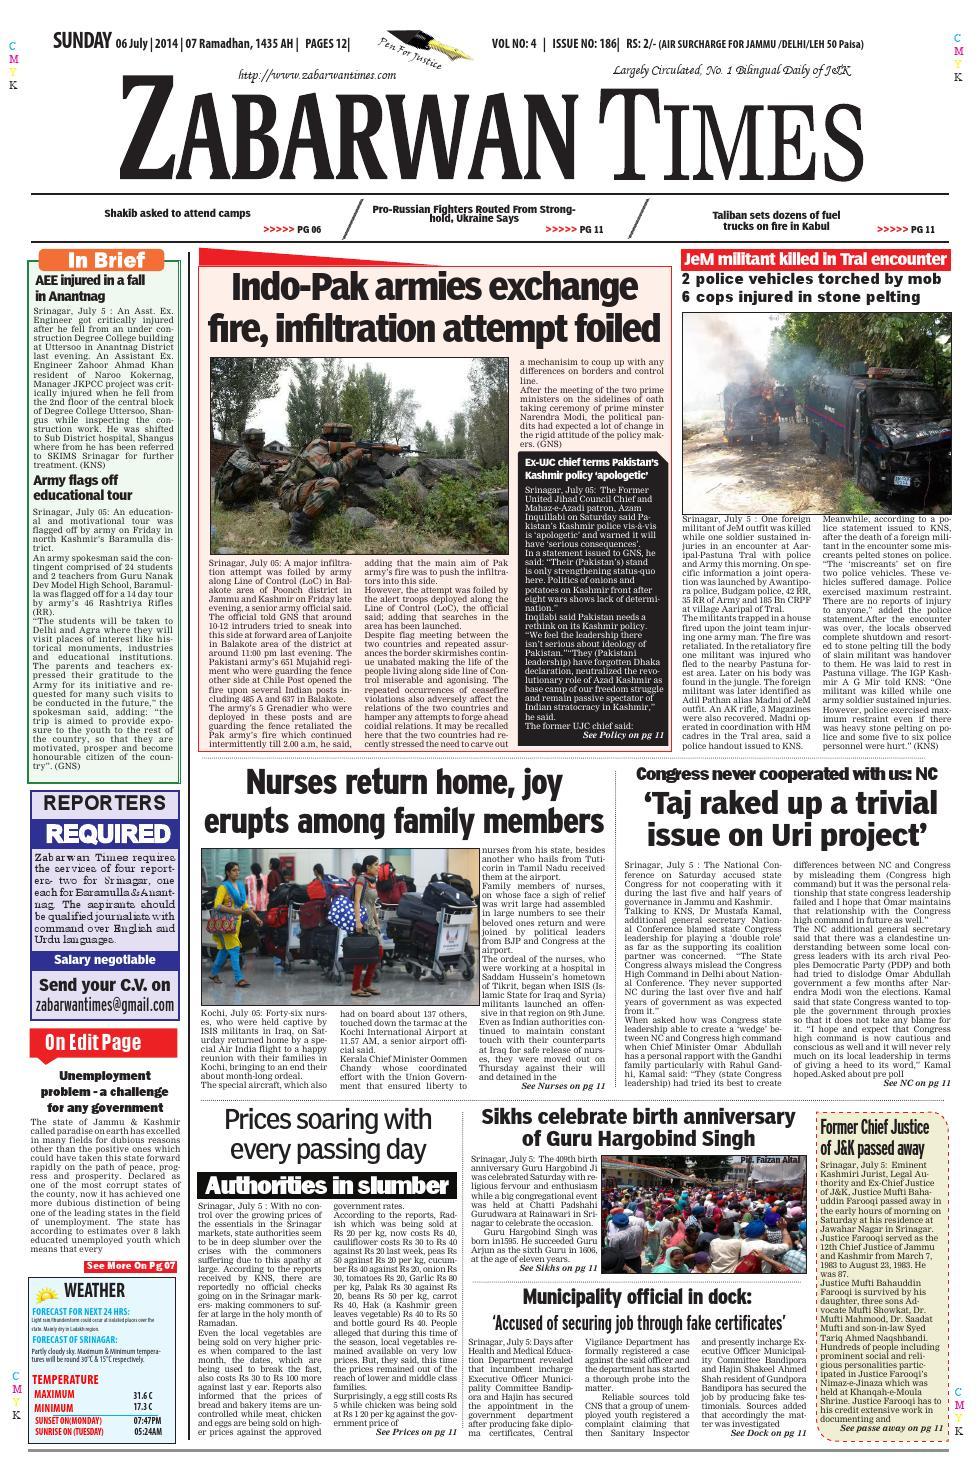 zabarwan times epaper english 06 july 2014 by zabarwan